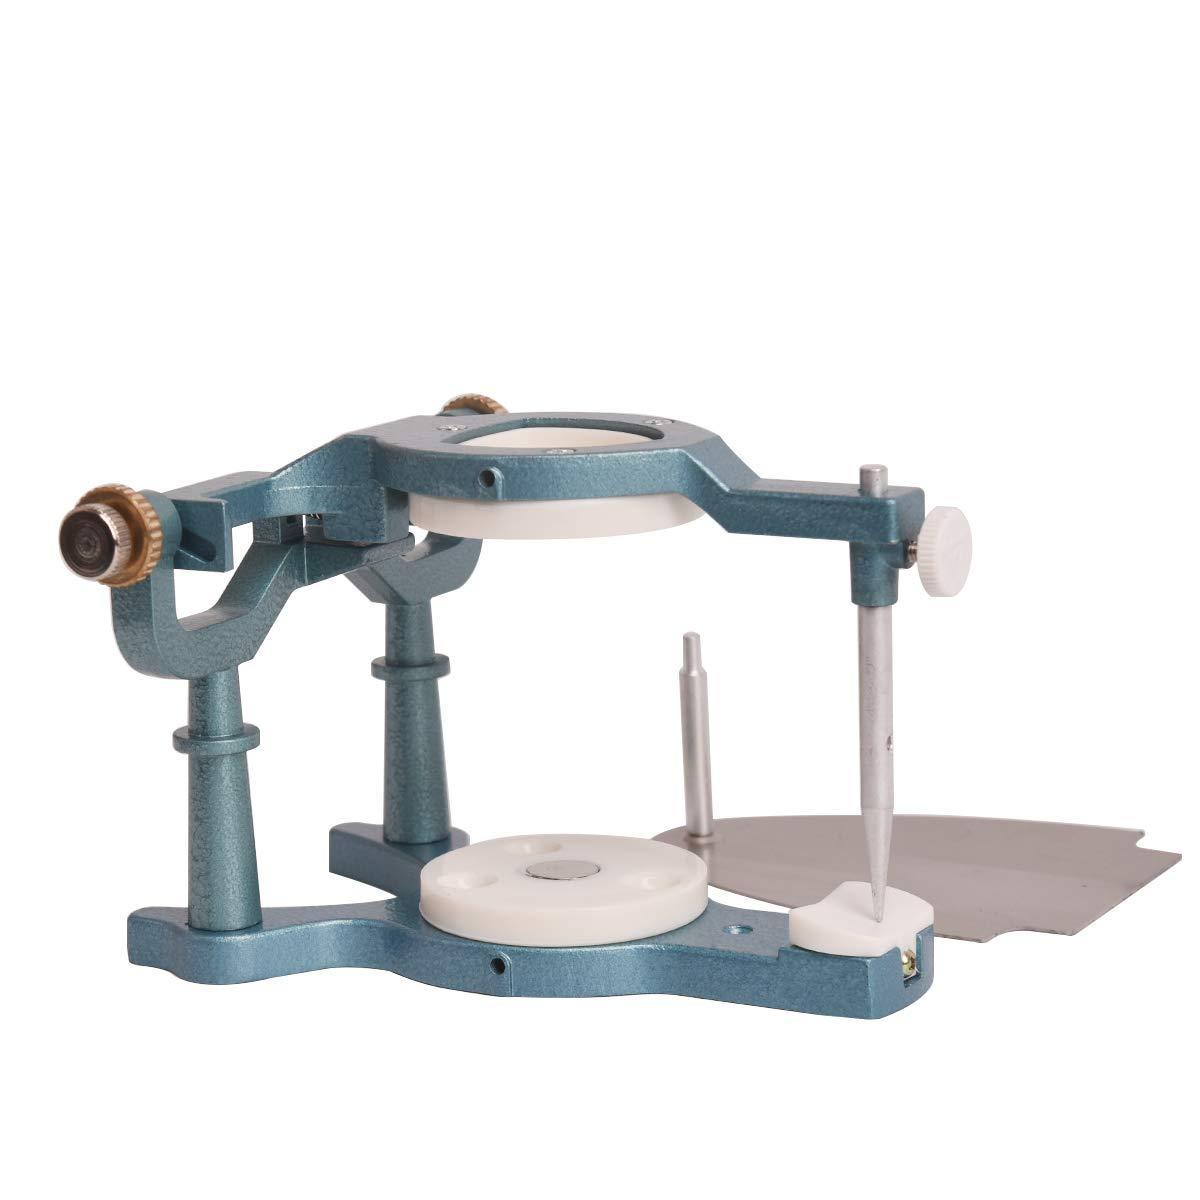 Dental Magnetic Articulator, Adjustable Denture Articulator Laboratory Instruments by Annhua (Image #2)